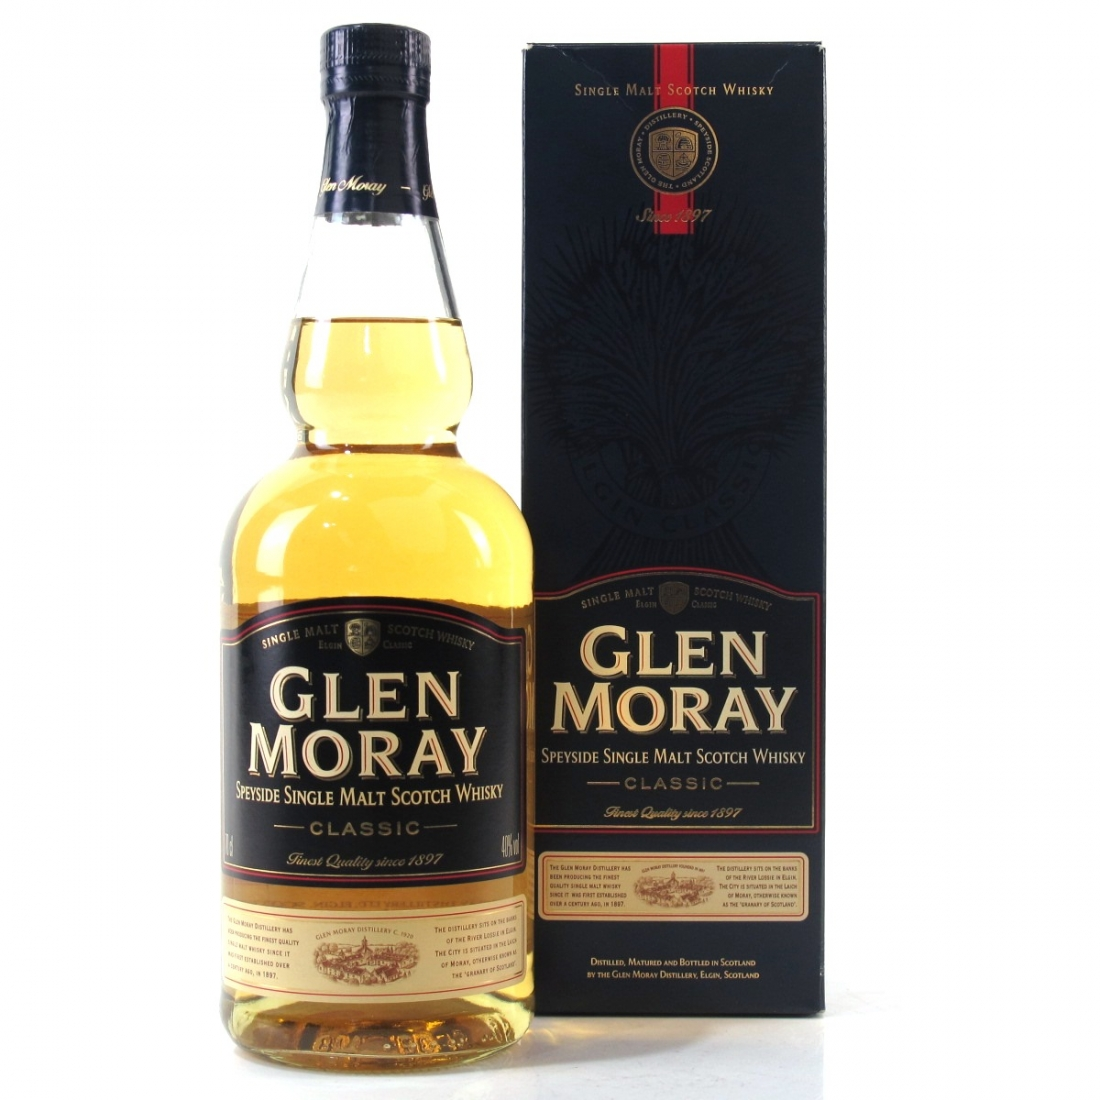 Glen Moray Classic